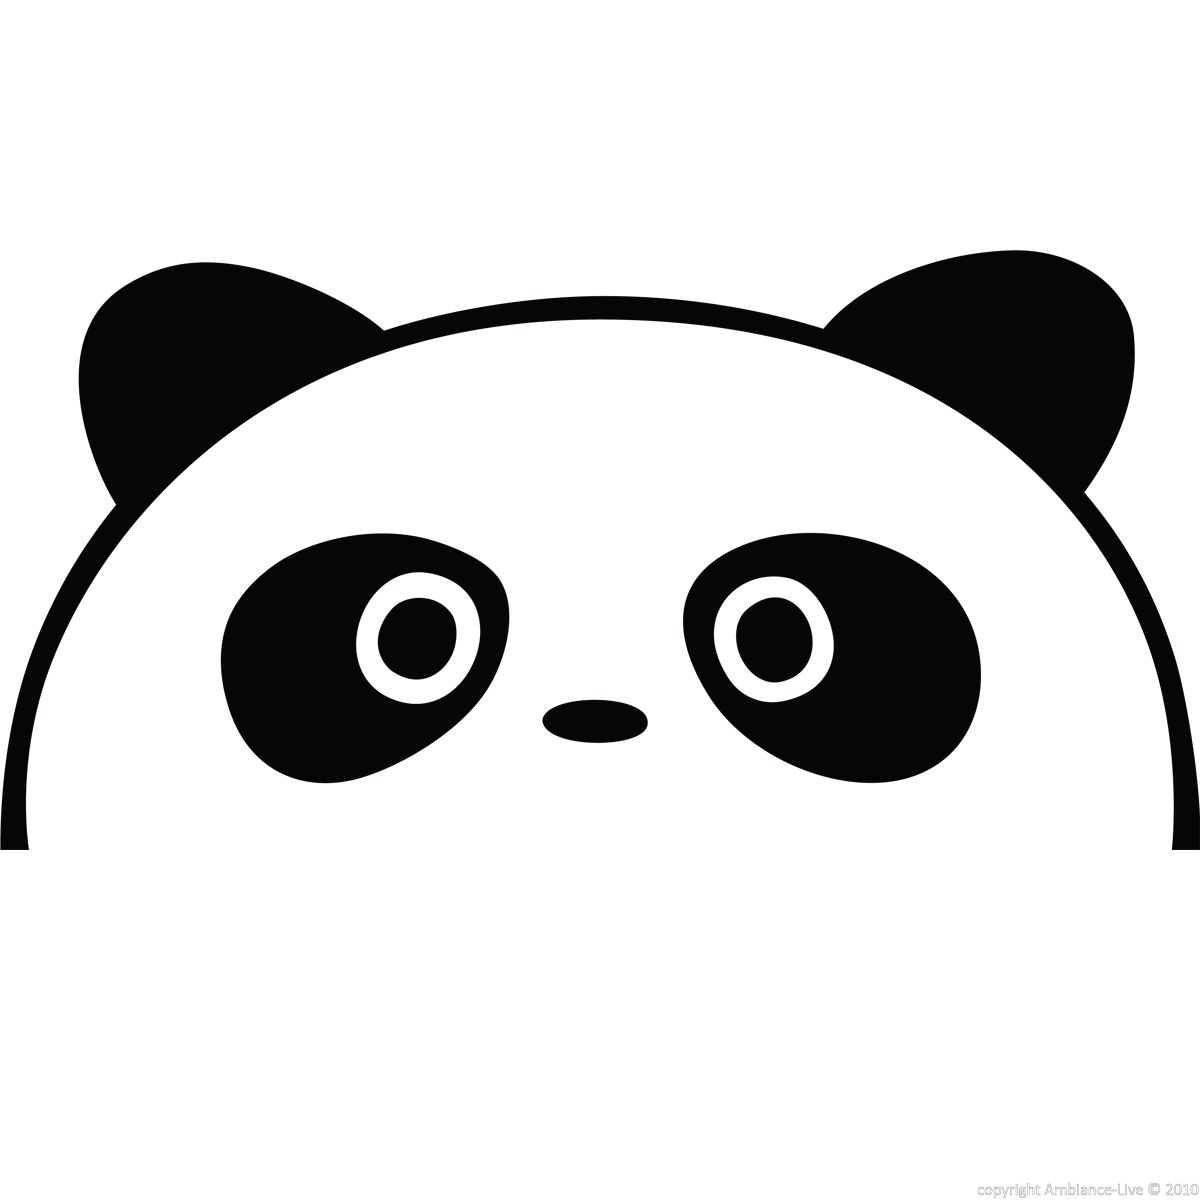 Dessins pandas rigolos recherche google pandas pinterest - Coloriage panda maternelle ...